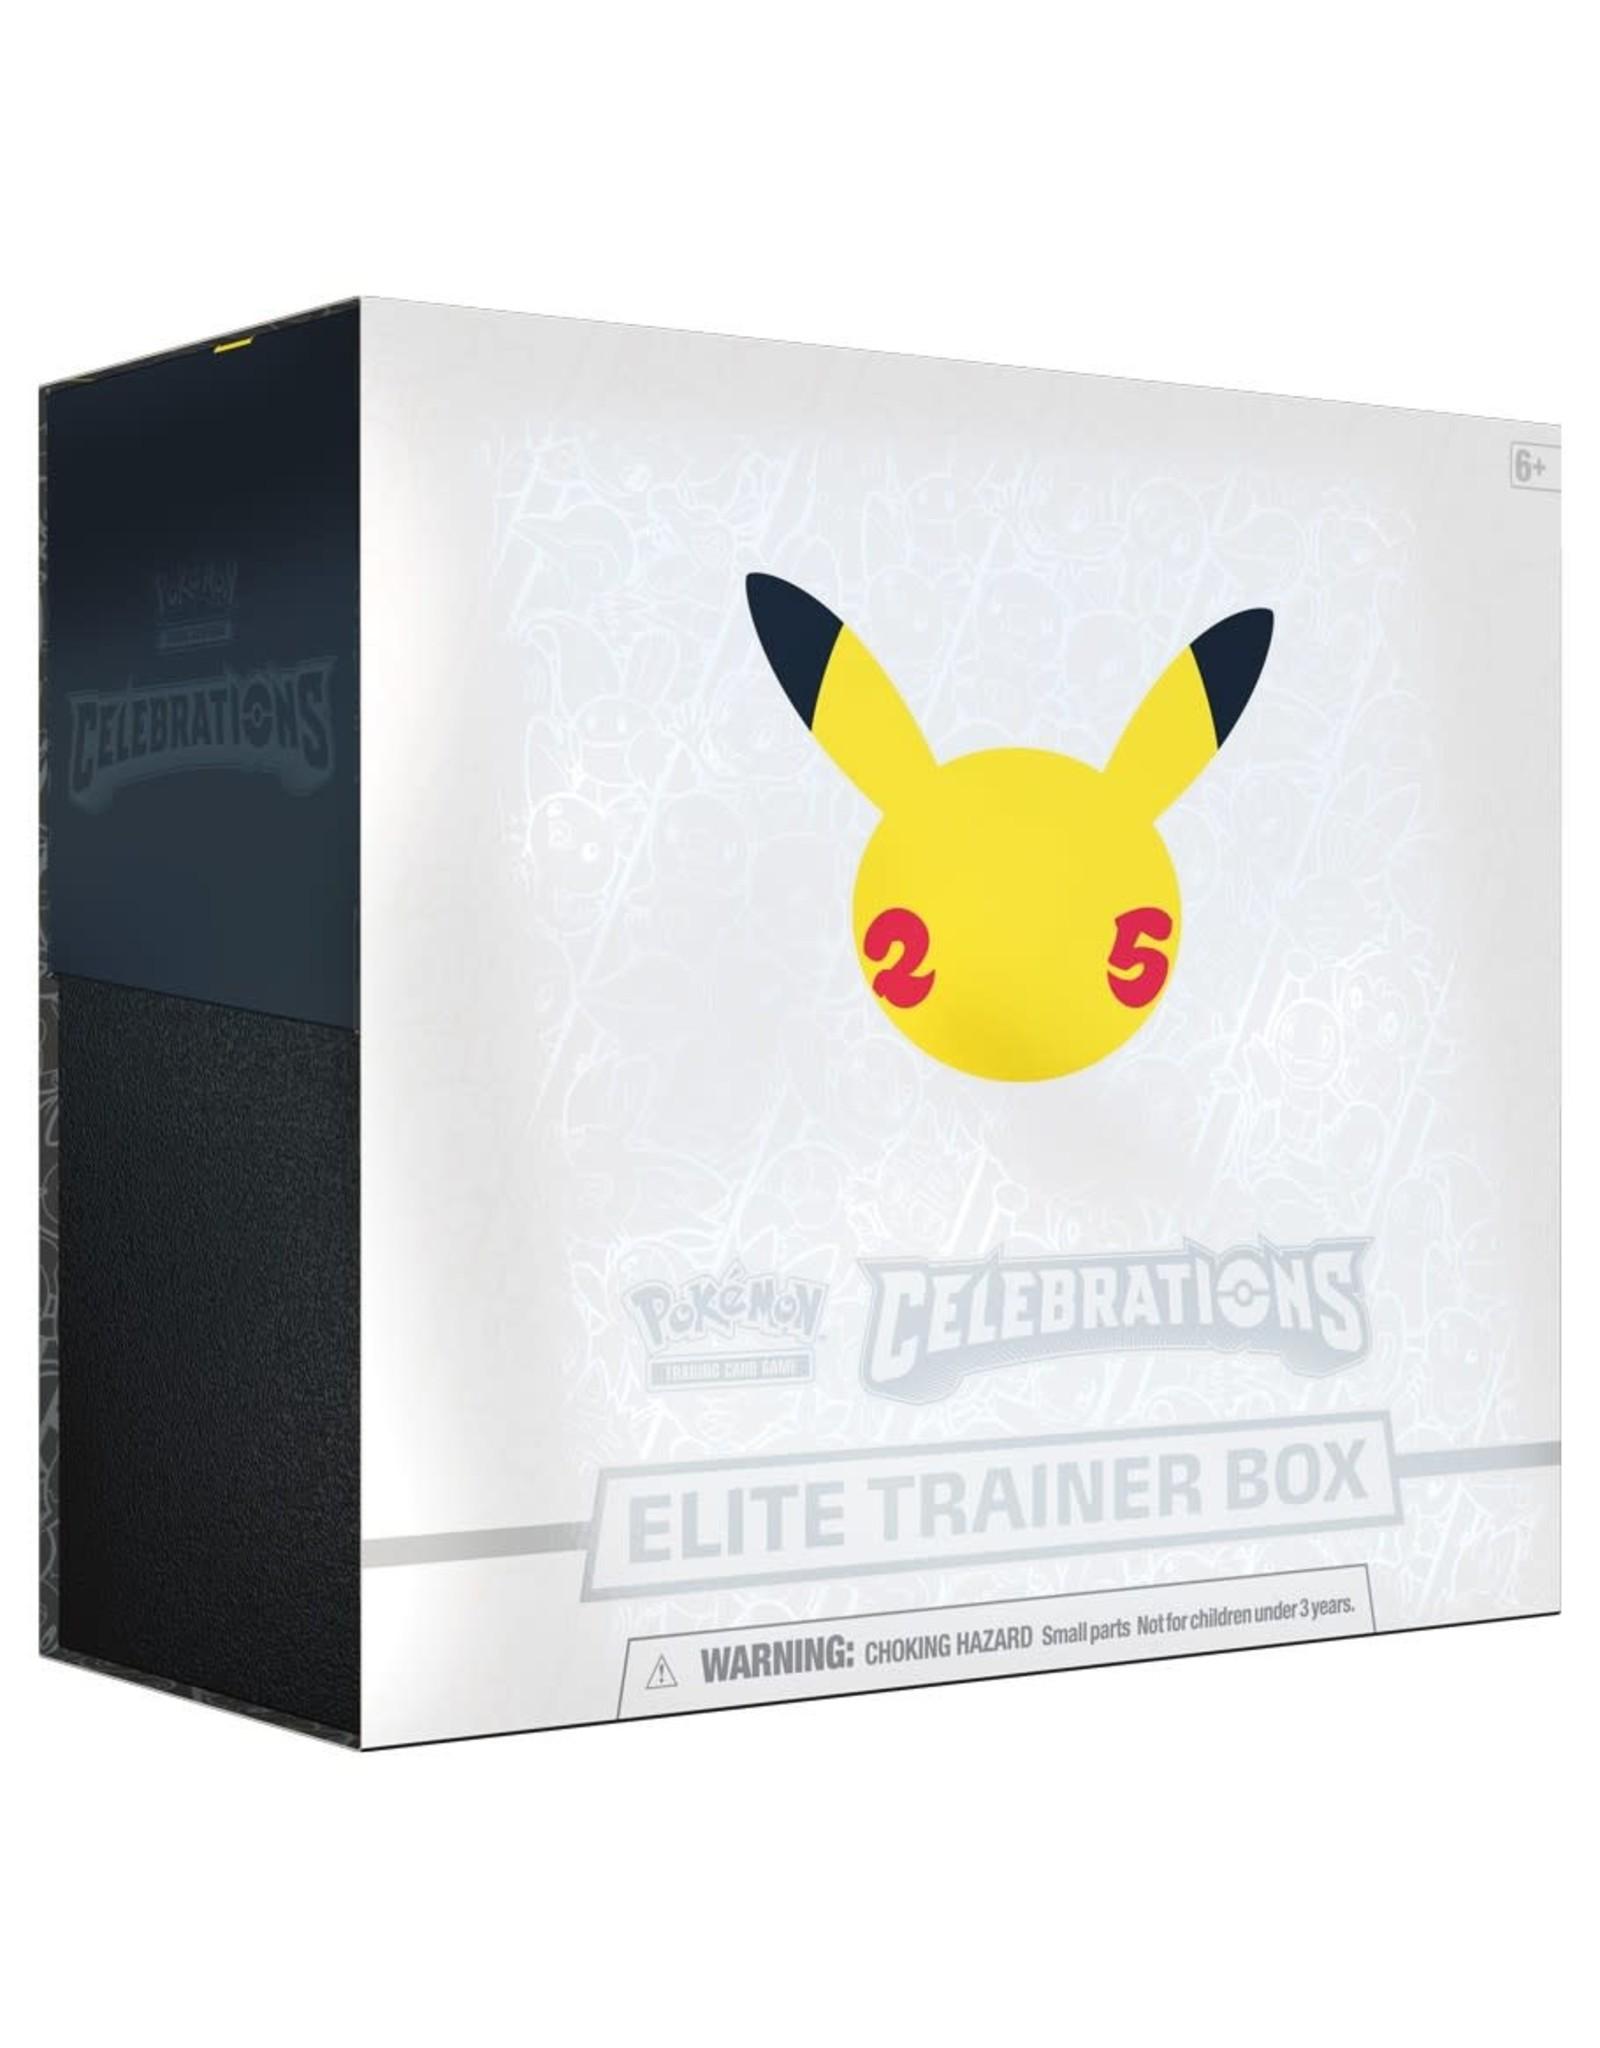 Pokemon: Celebrations Elite Trainer Box - PREORDER, AVAILABLE OCT 8